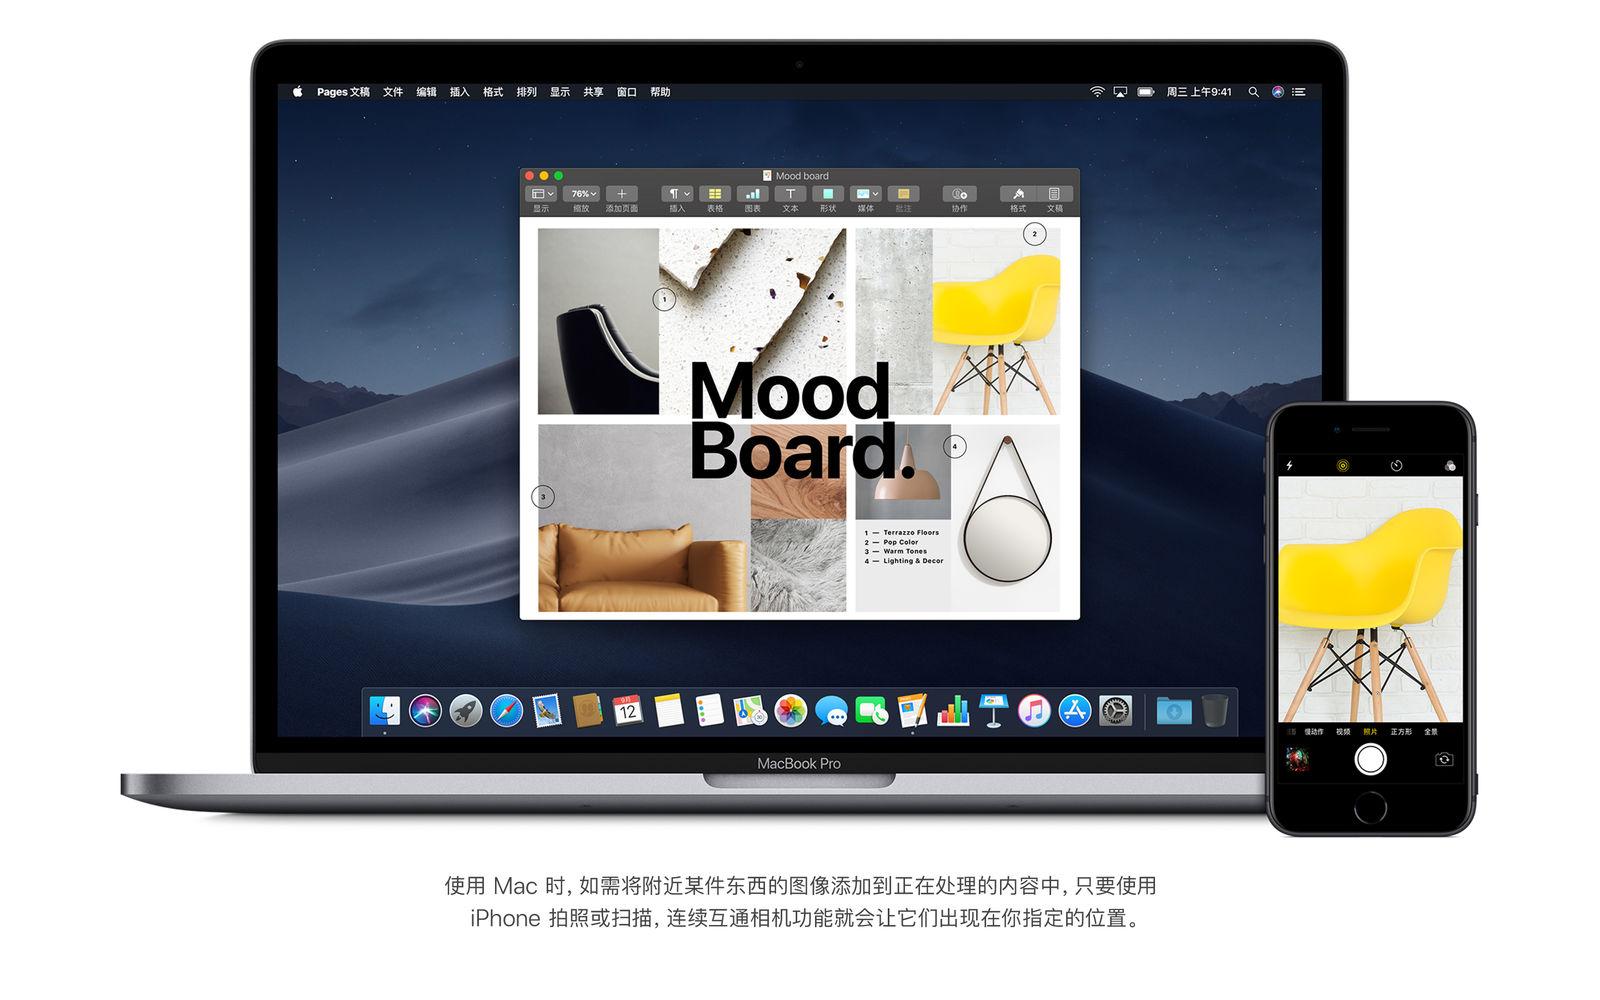 macOS Mojave 10.14.0苹果的macOS系统